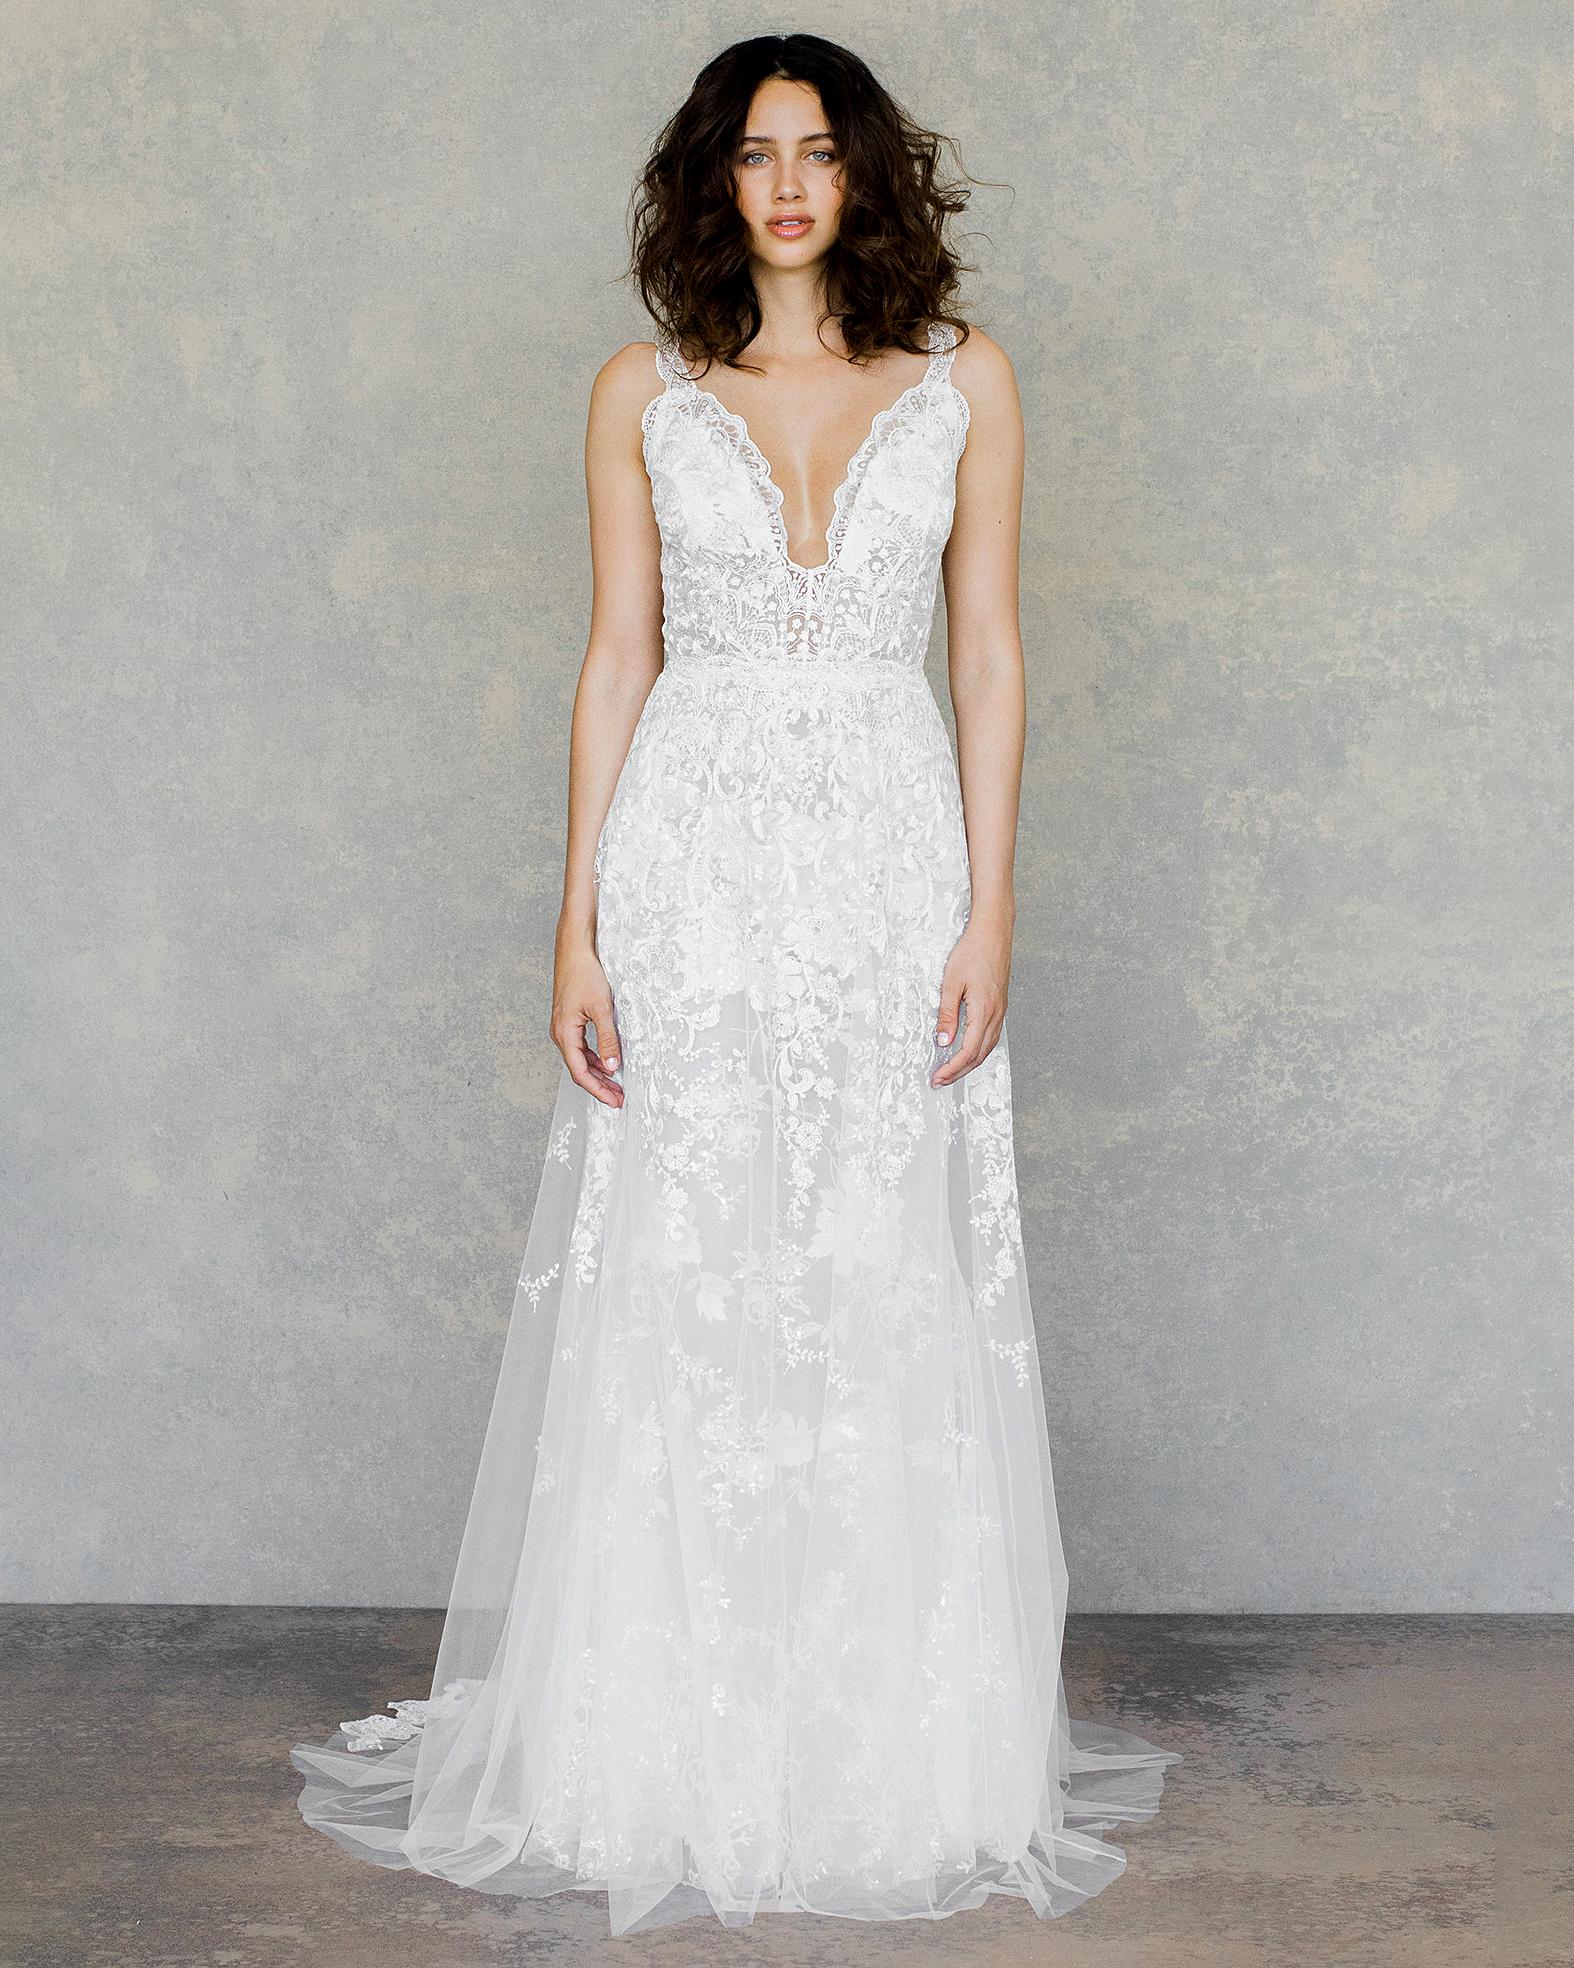 claire pettibone wedding dress spring 2019 v-neck lace detail